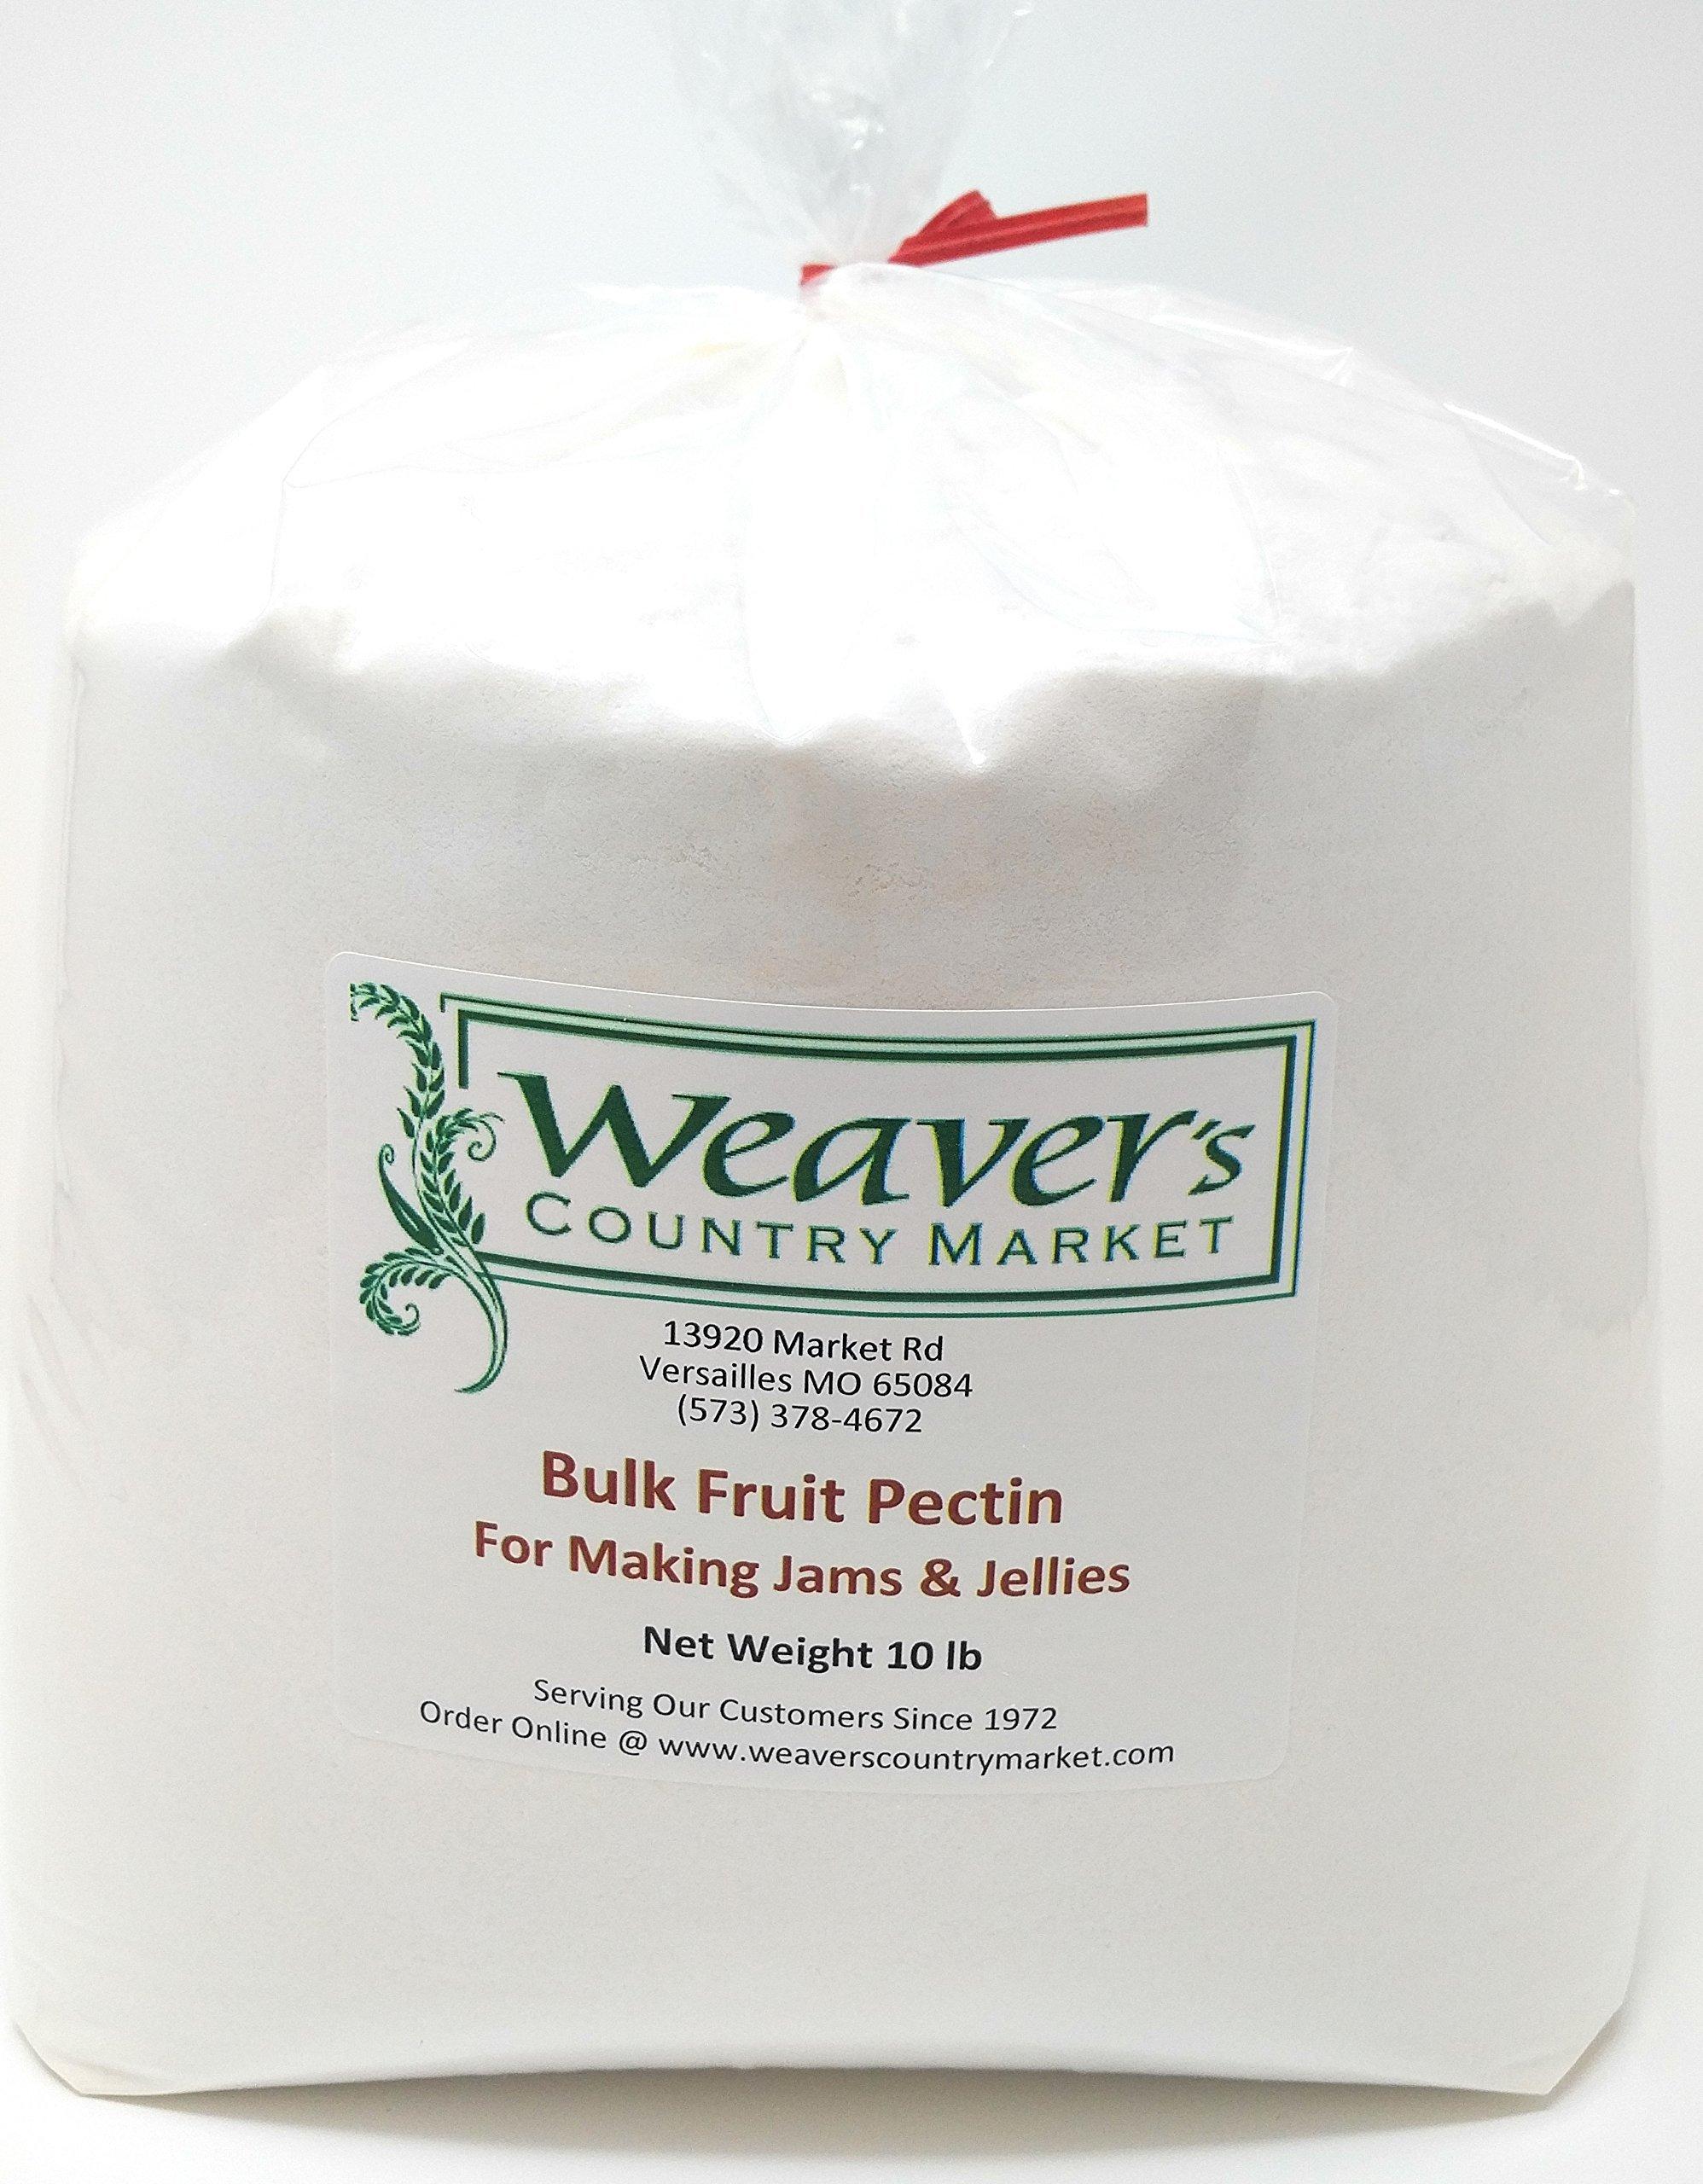 Weaver's Country Market Bulk Fruit Pectin Mix for Making Jams & Jellies (10 Lb. Plastic Bag) by Weaver's Country Market (Image #1)